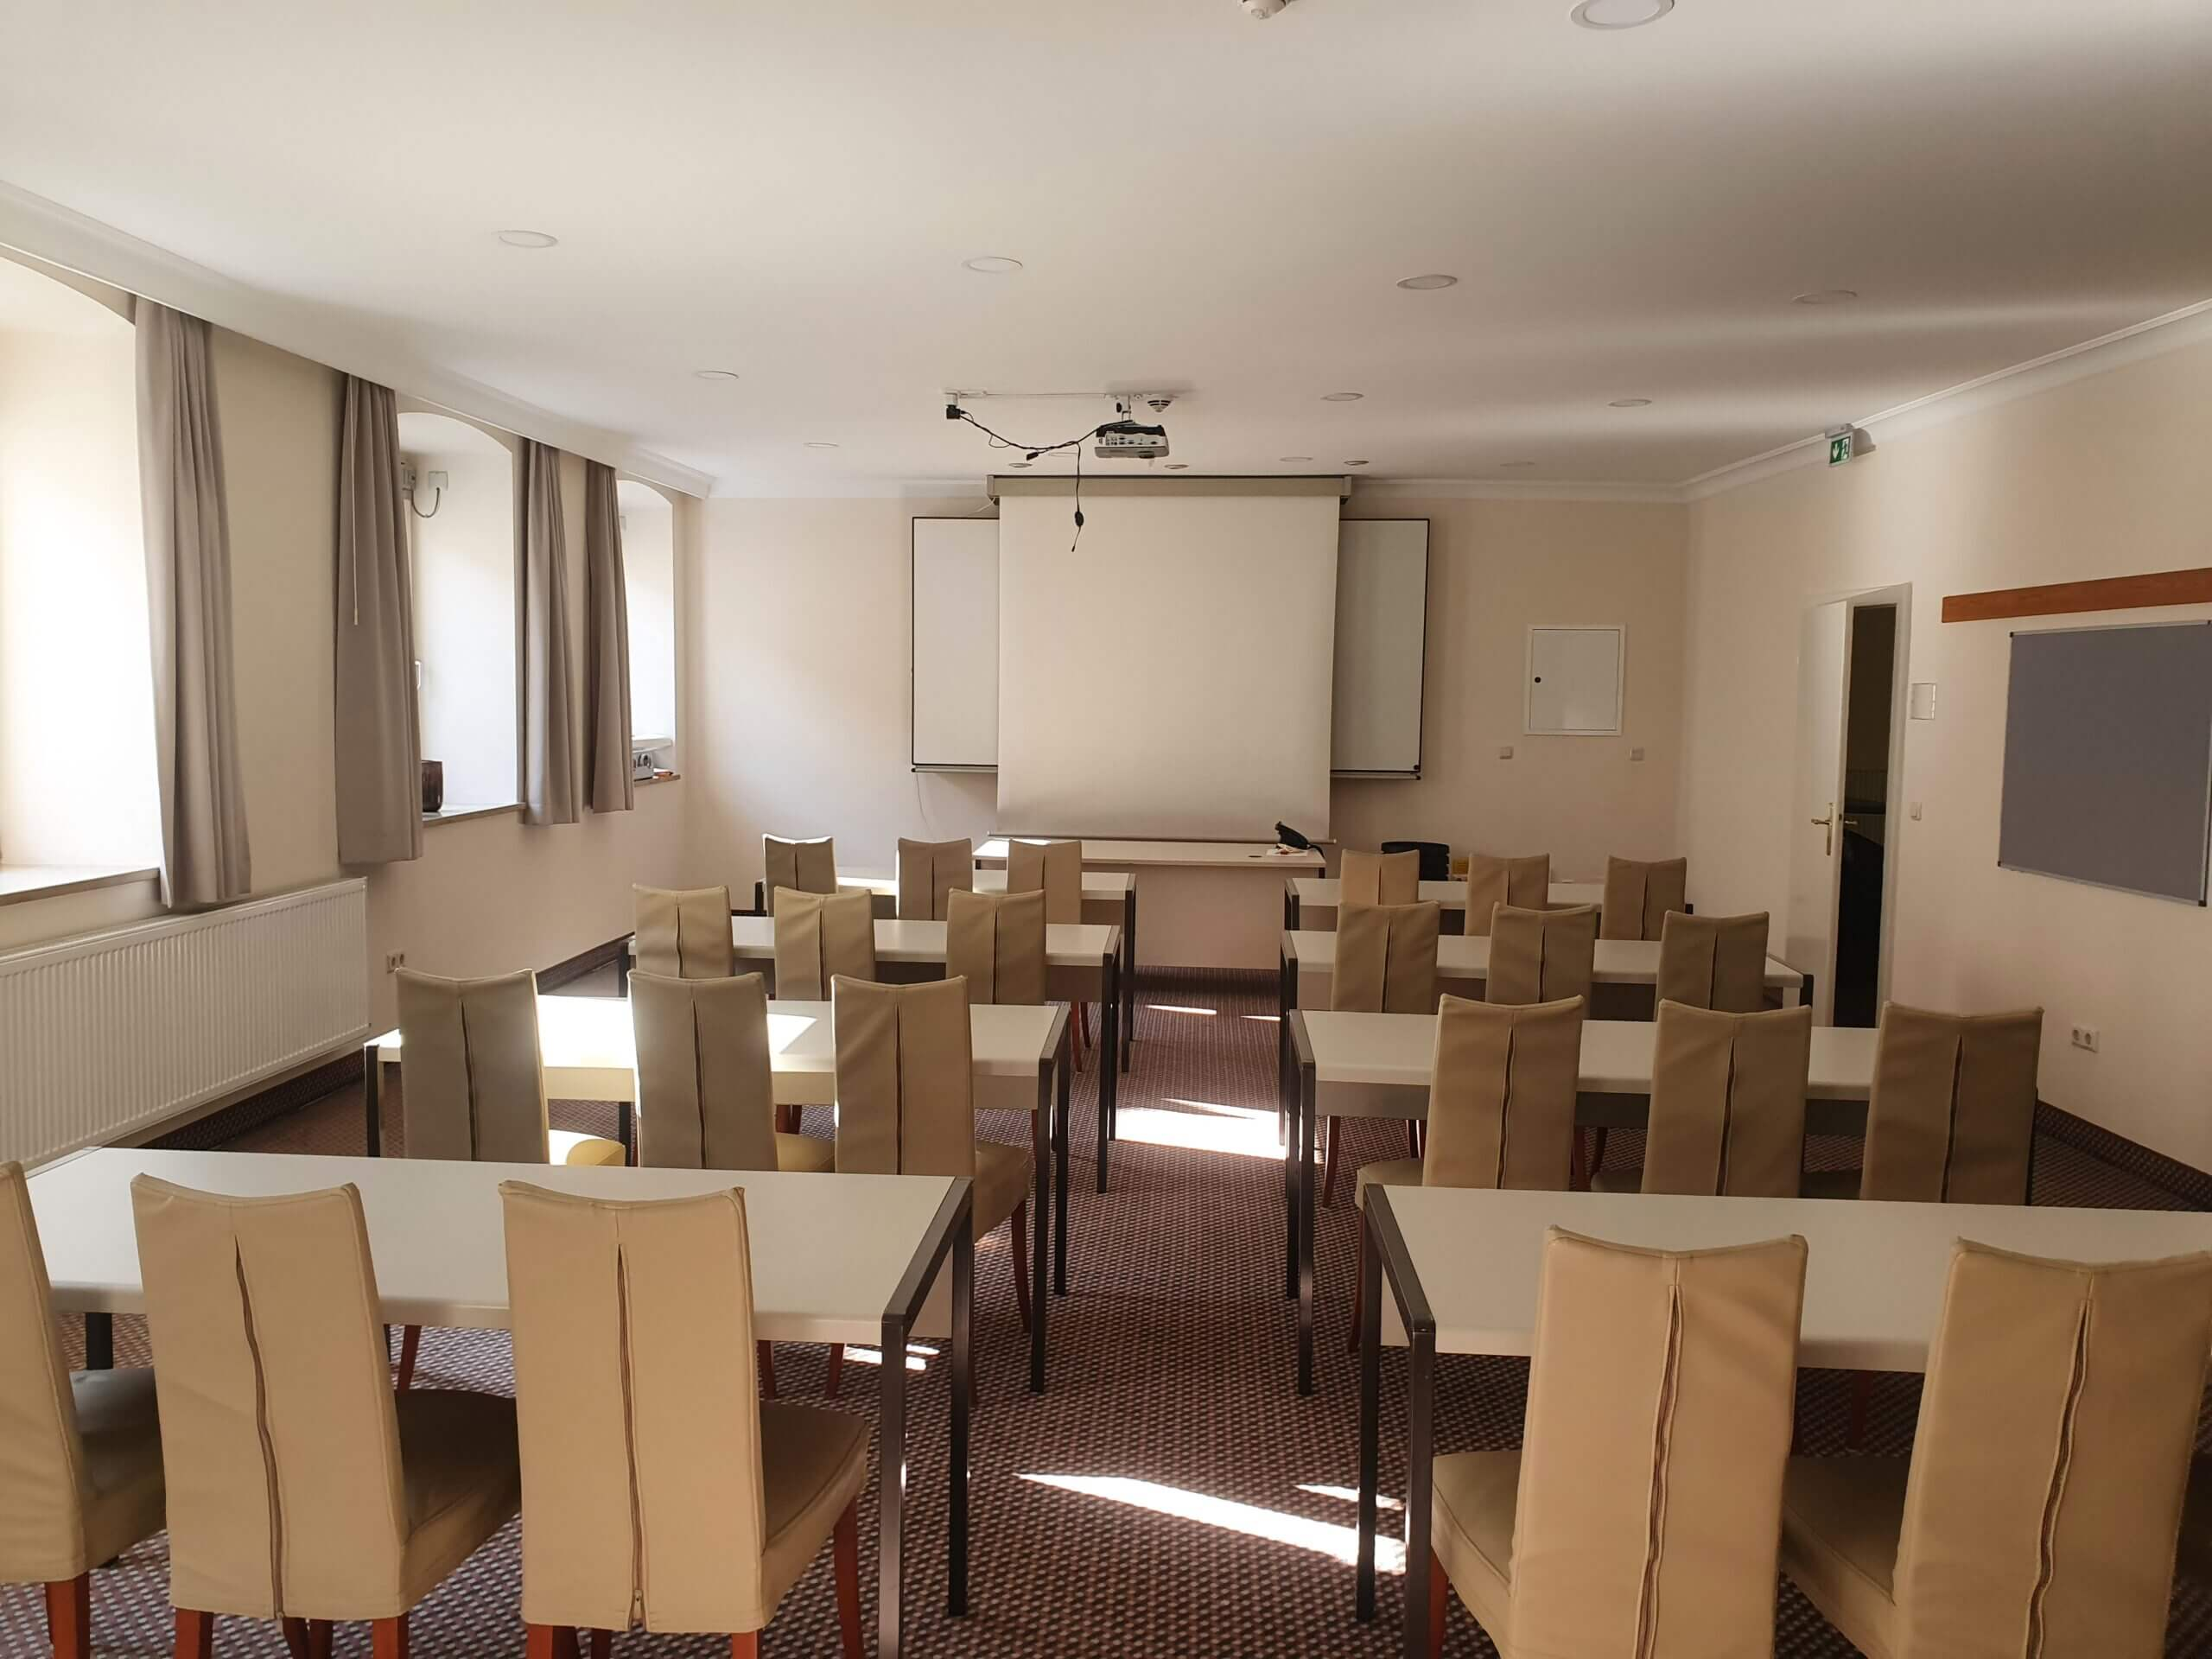 Hotel Fletzinger Schulungsraum